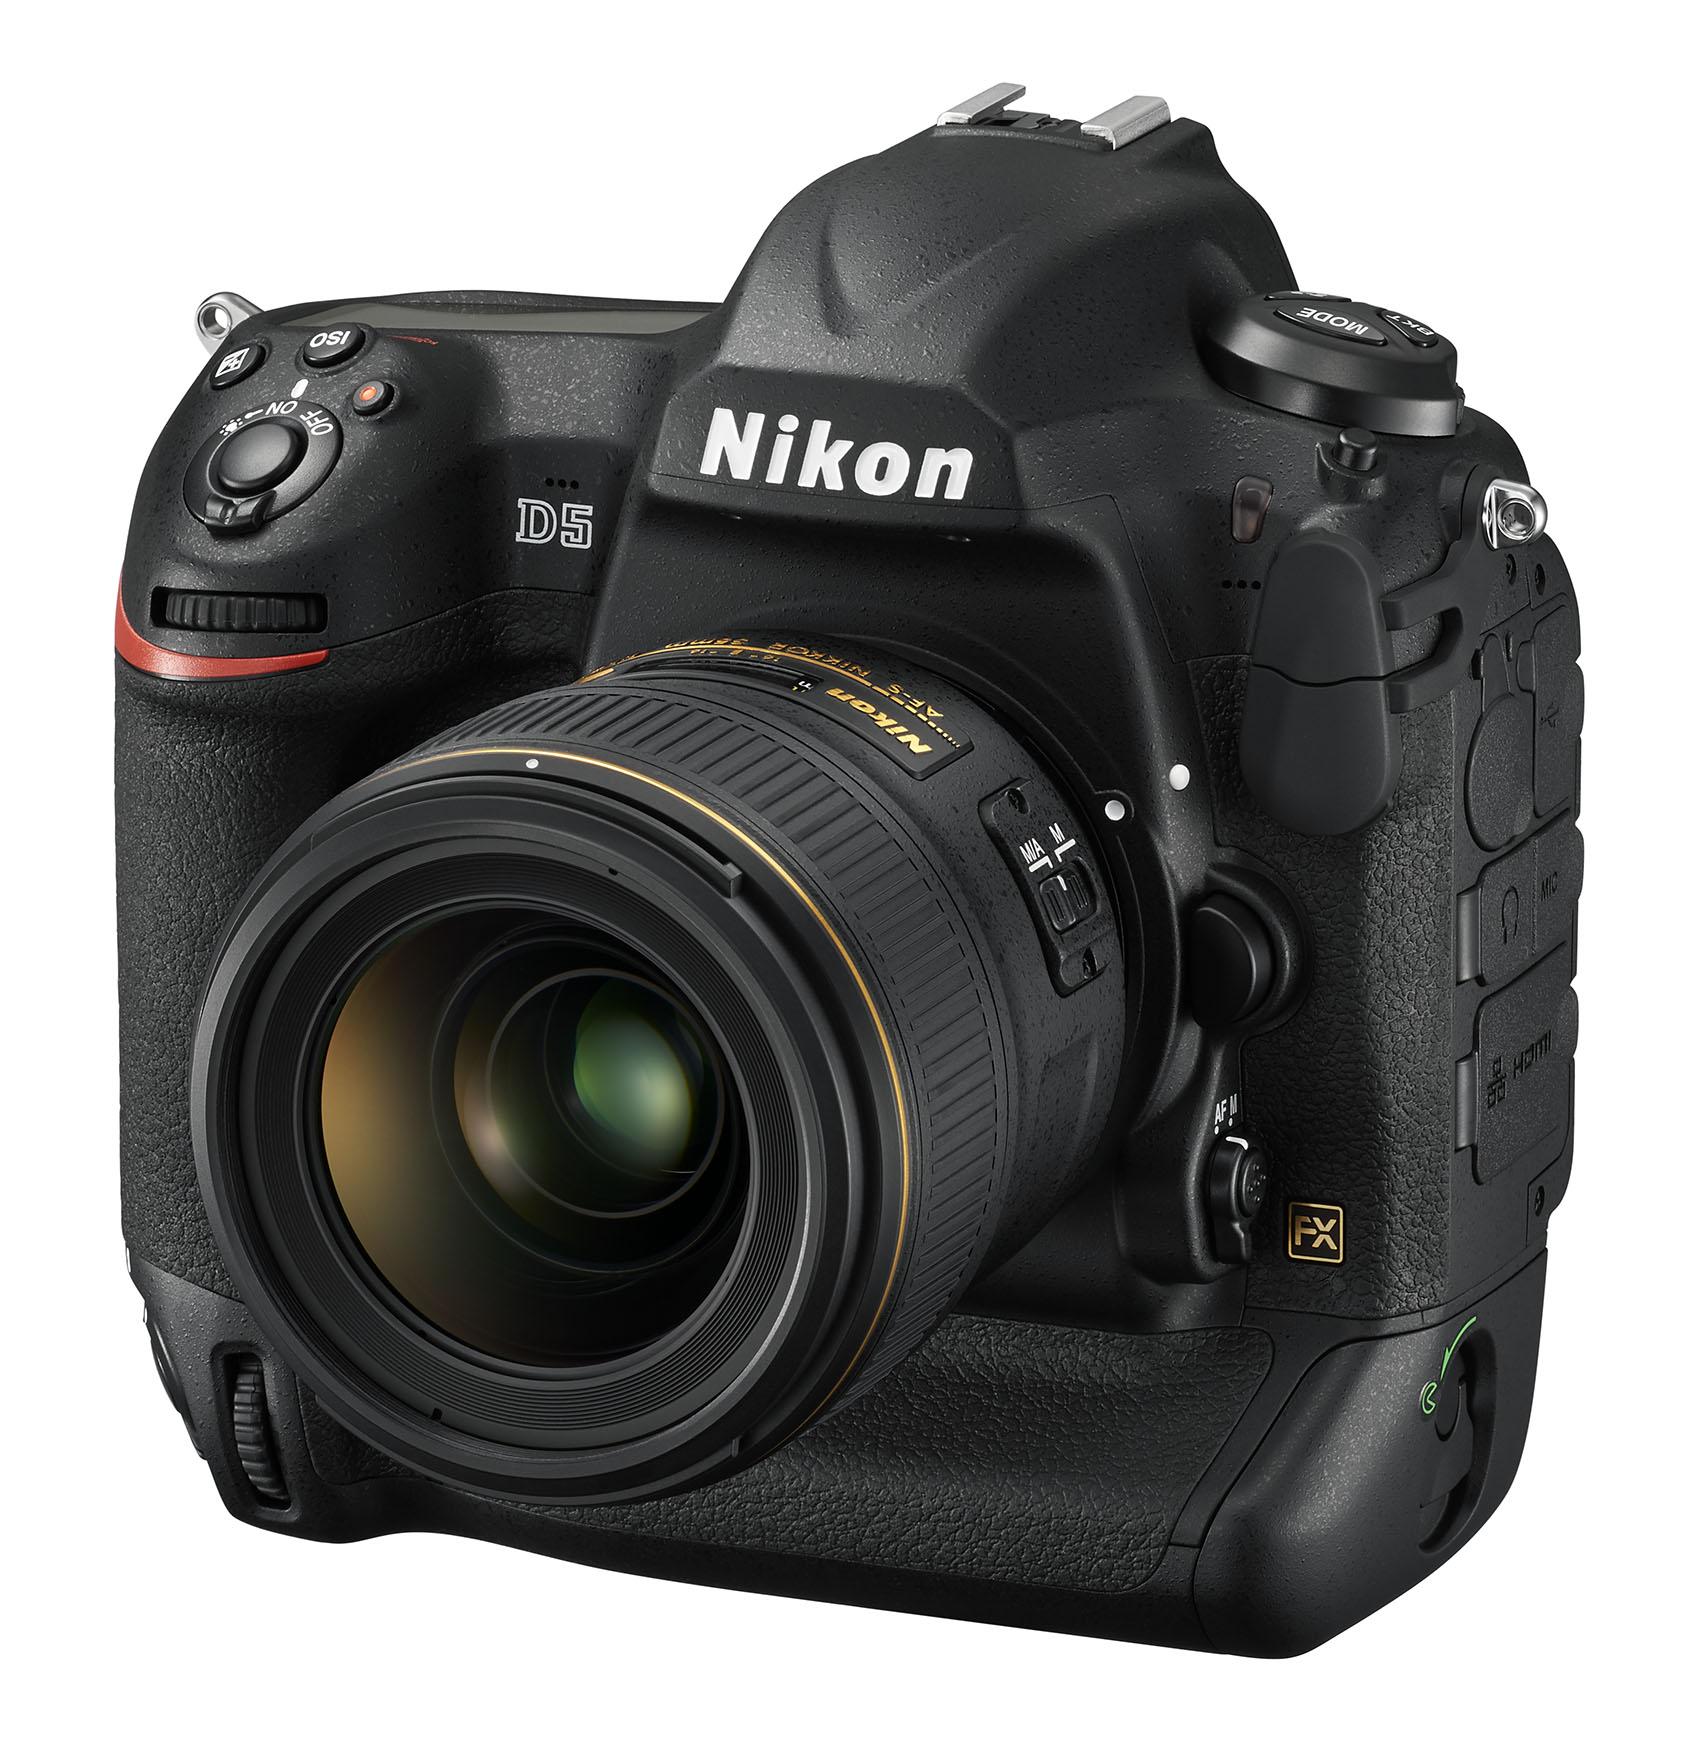 Nikon Slr Type Digital Cameras Kabel Data Usb D40 D40x D50 D60 D70 D70s D80 D90 D100 D200 D300 D300s D600 D610 D700 D3000 D3100 D7000 D5